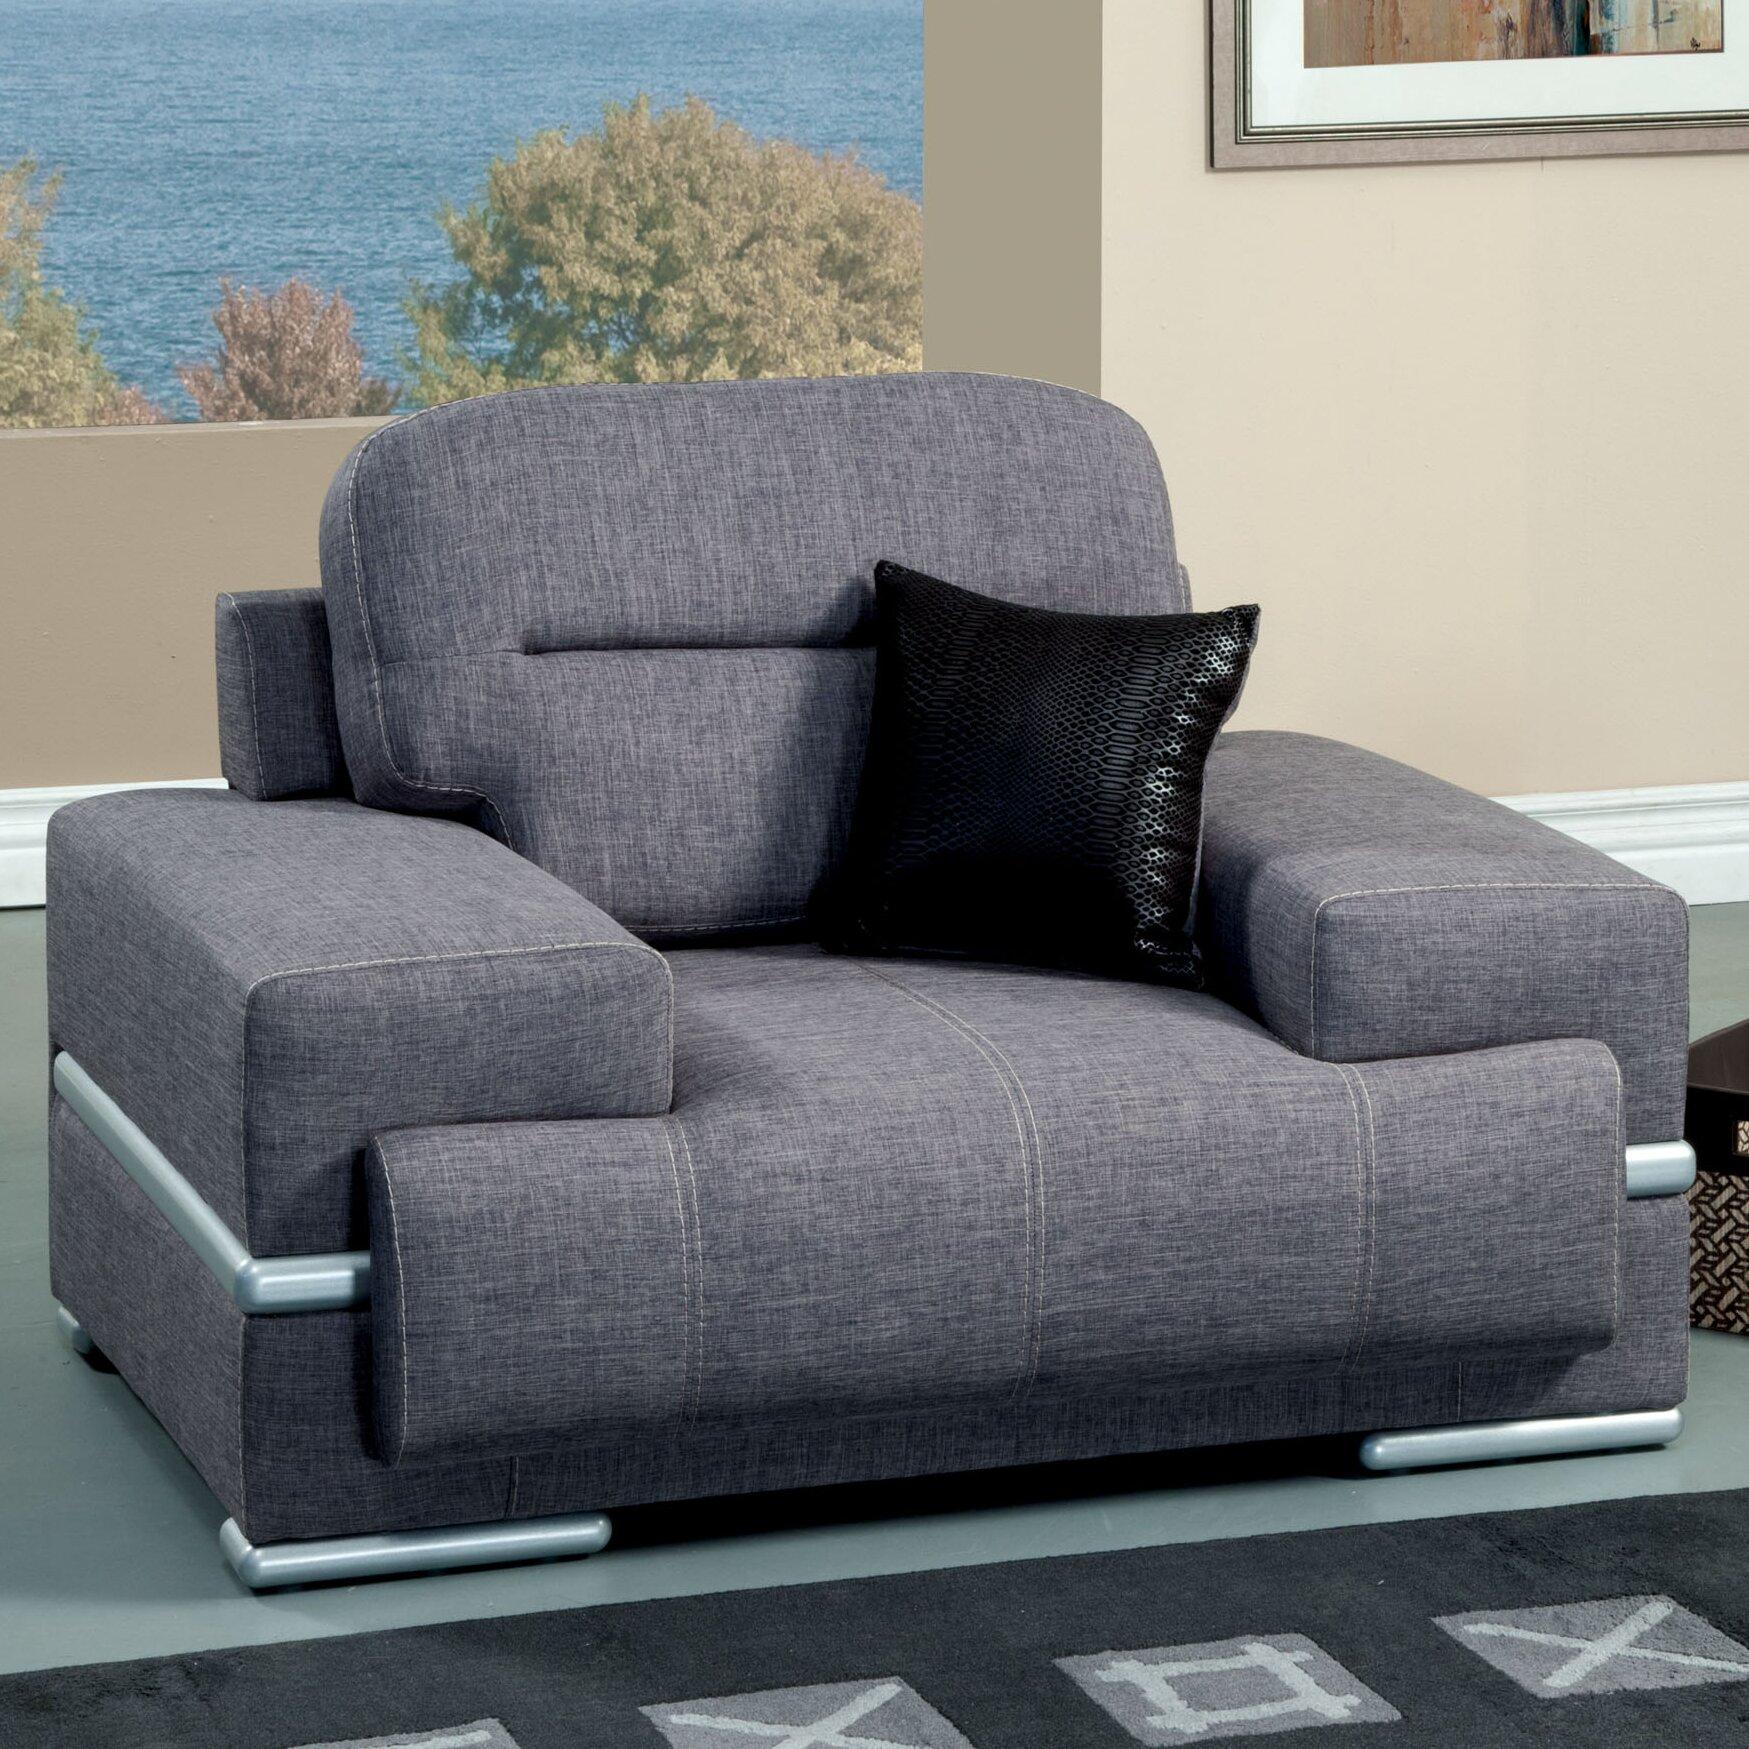 Hokku designs camberg living room collection reviews for Hokku designs living room furniture